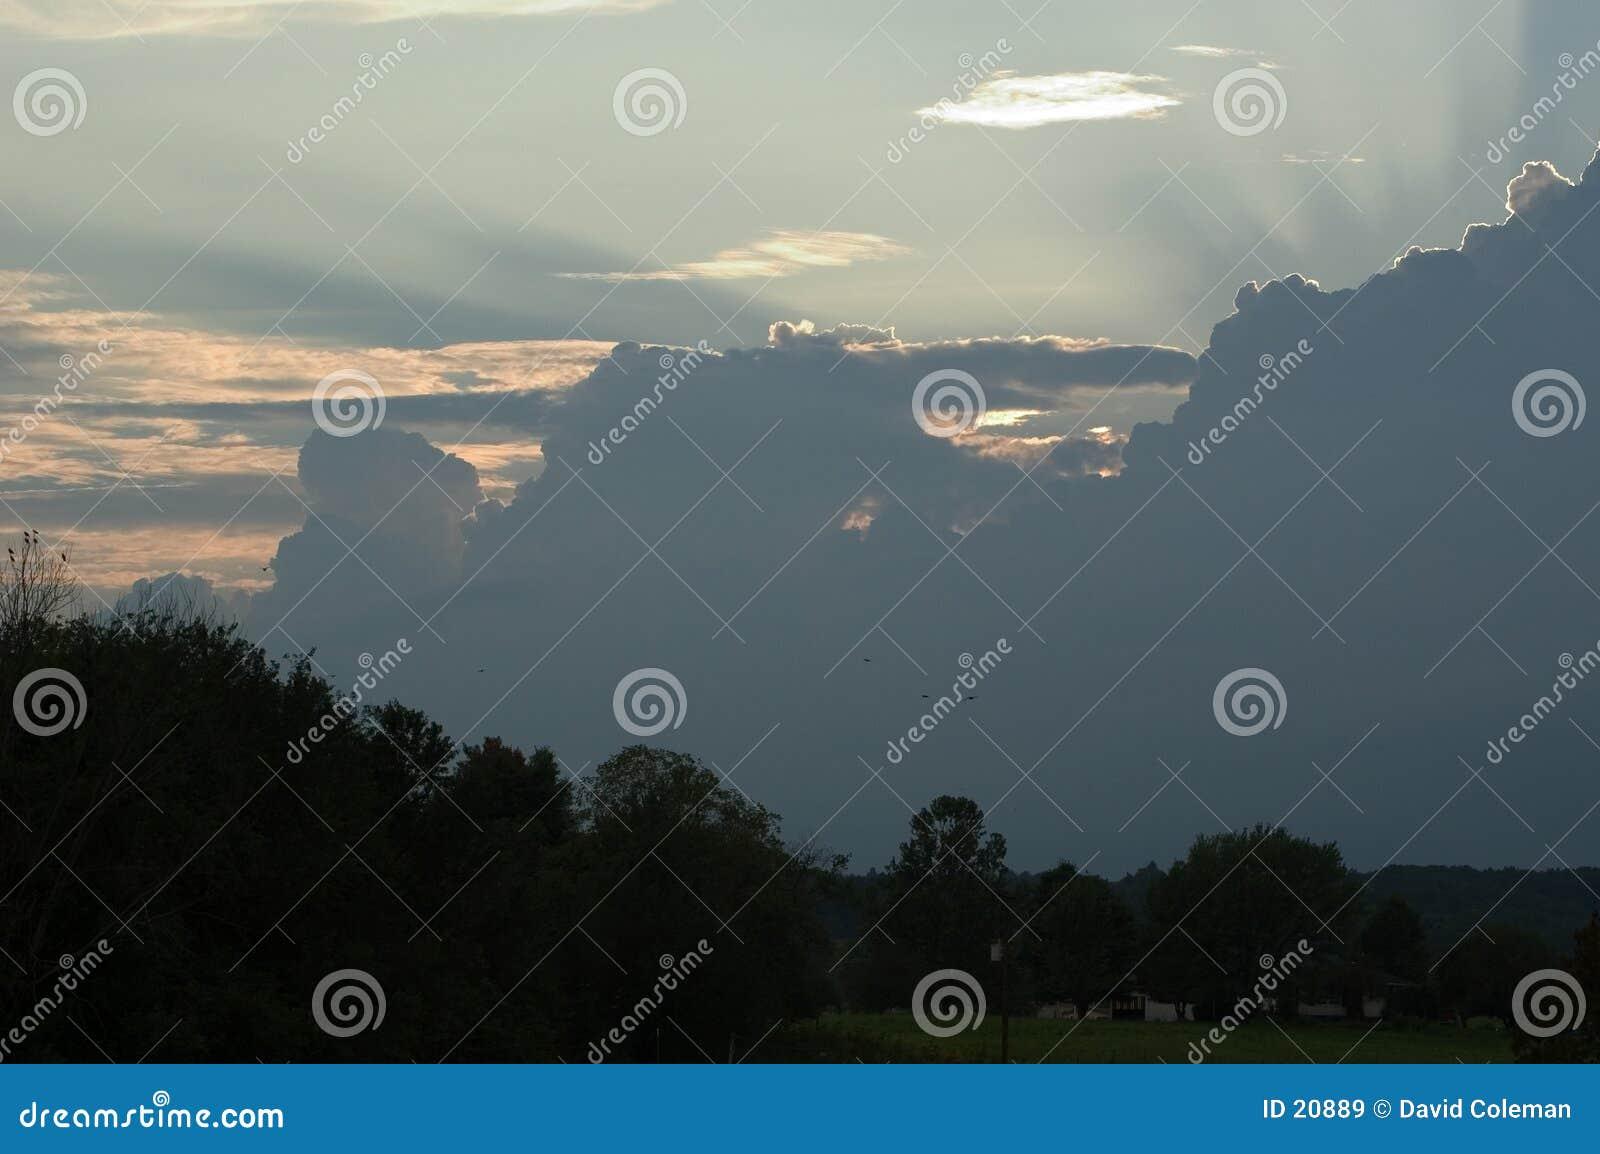 Luz solar que flui sobre nuvens de tempestade